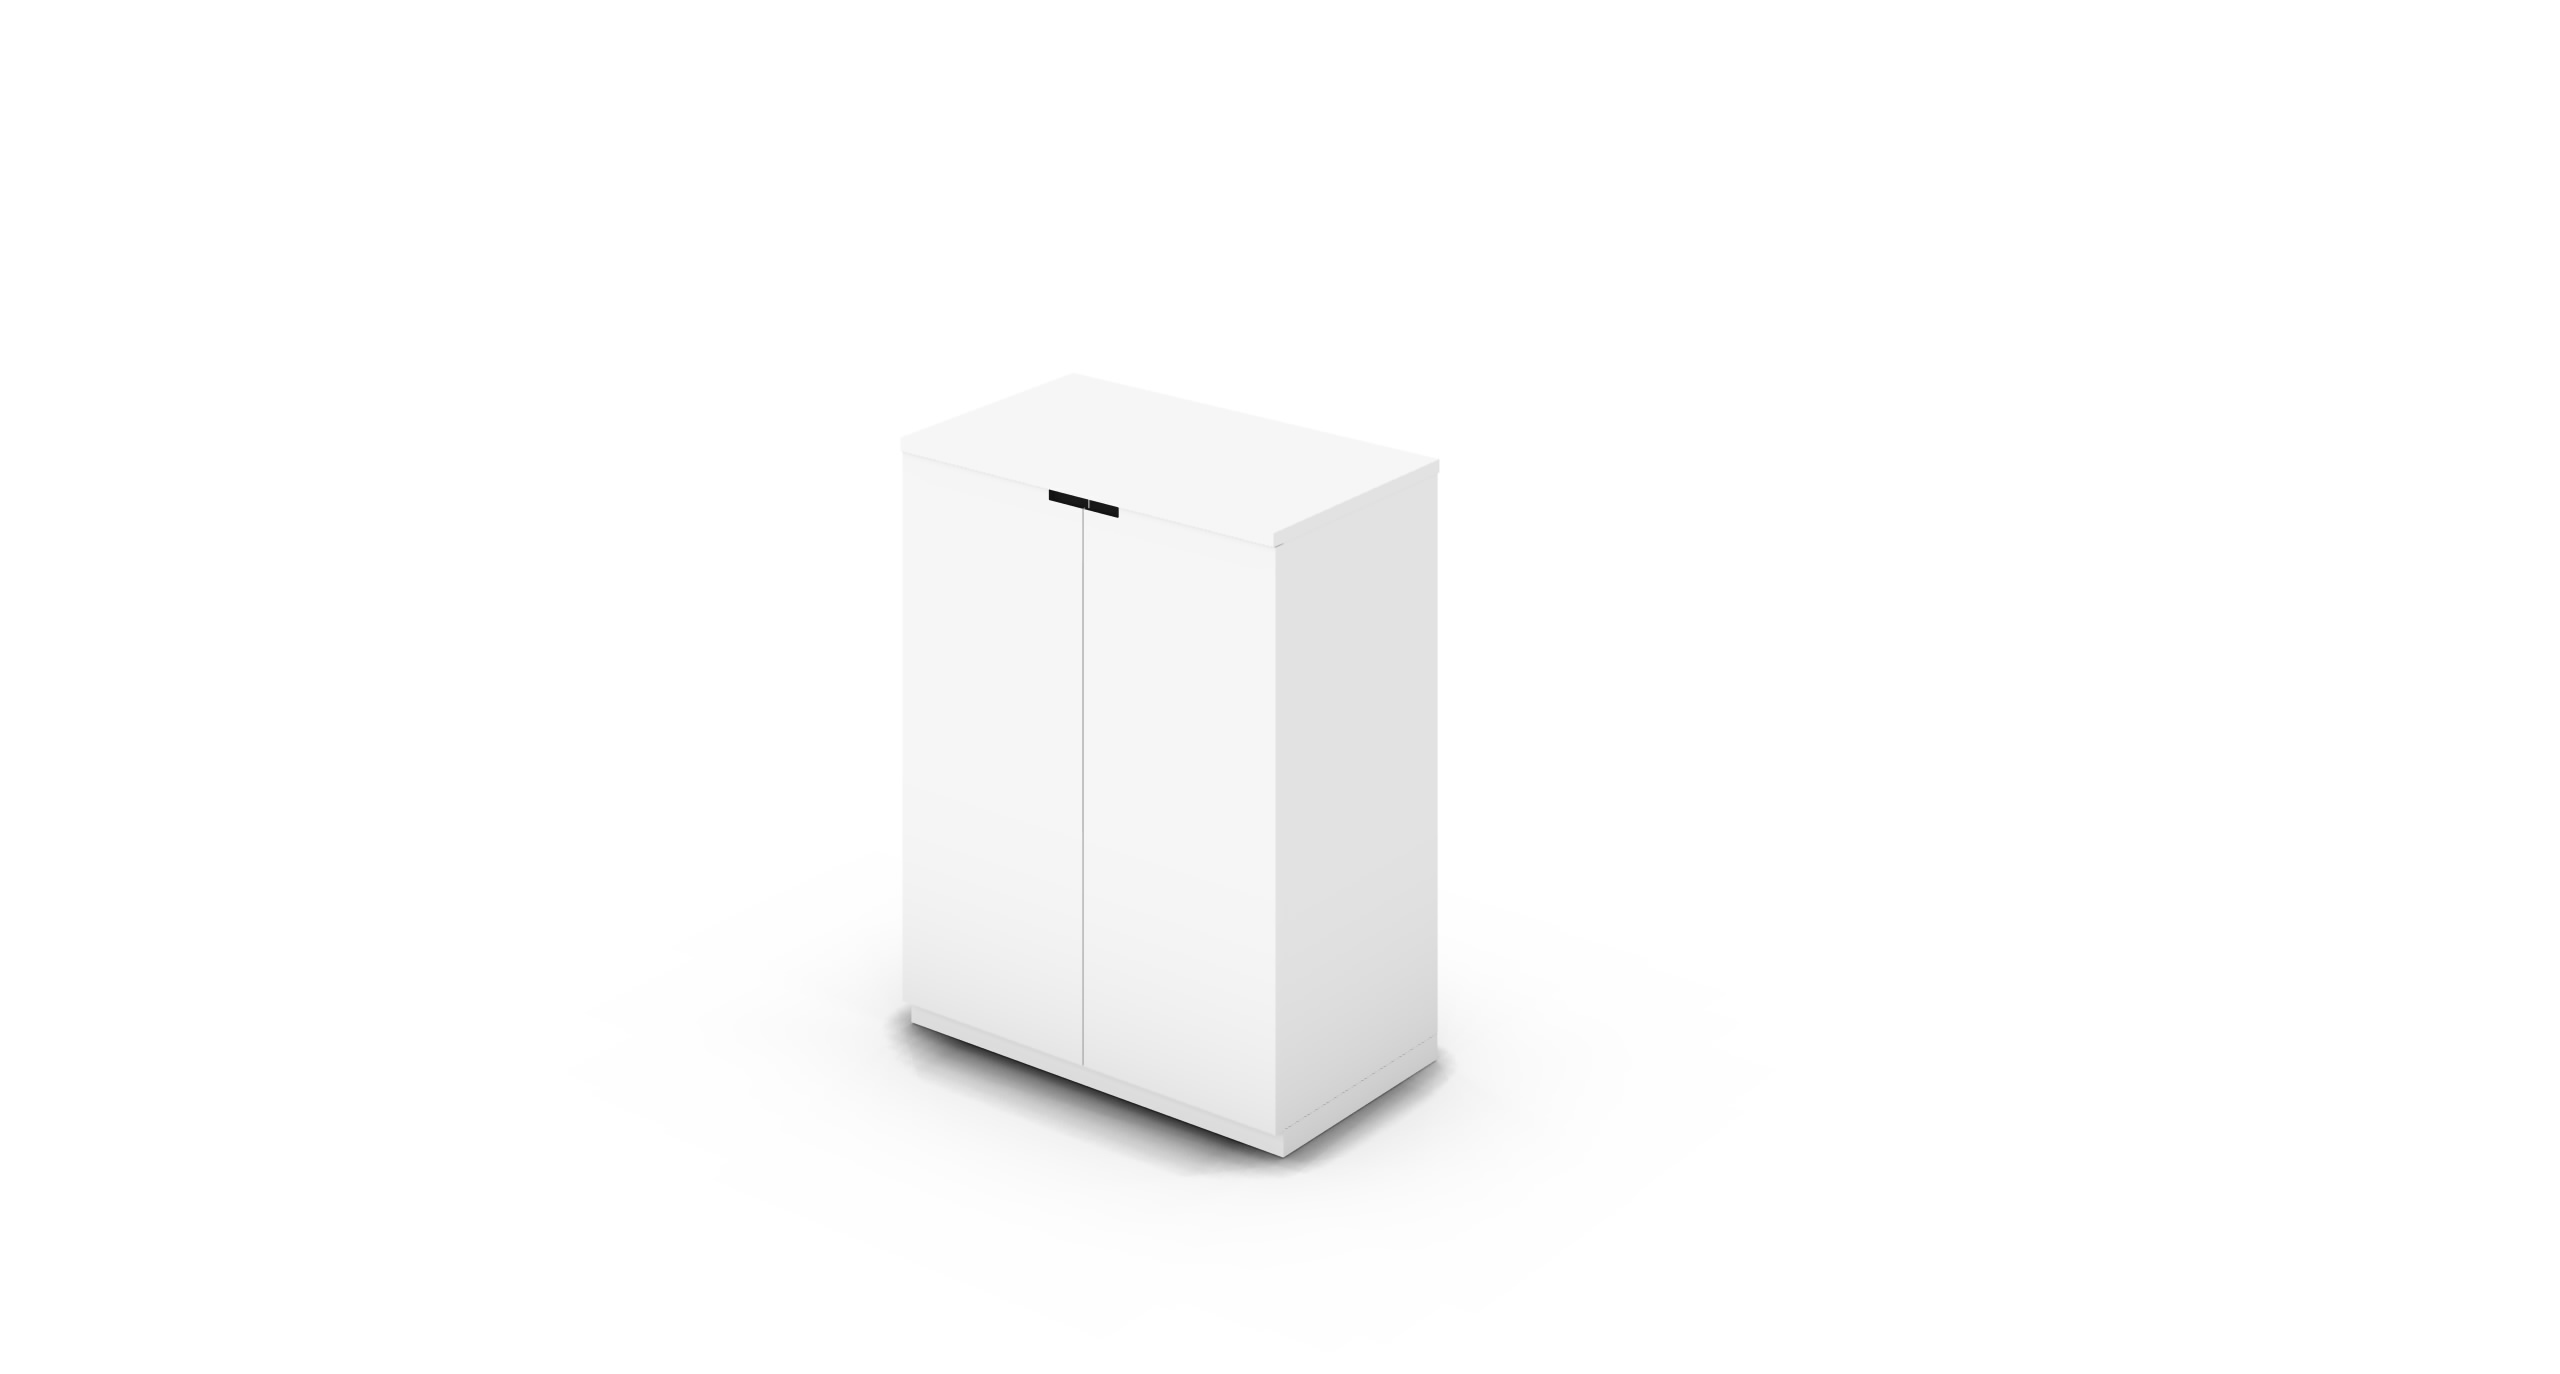 Cabinet_800x450x1125_HD_White_CutOut_NoCylinder